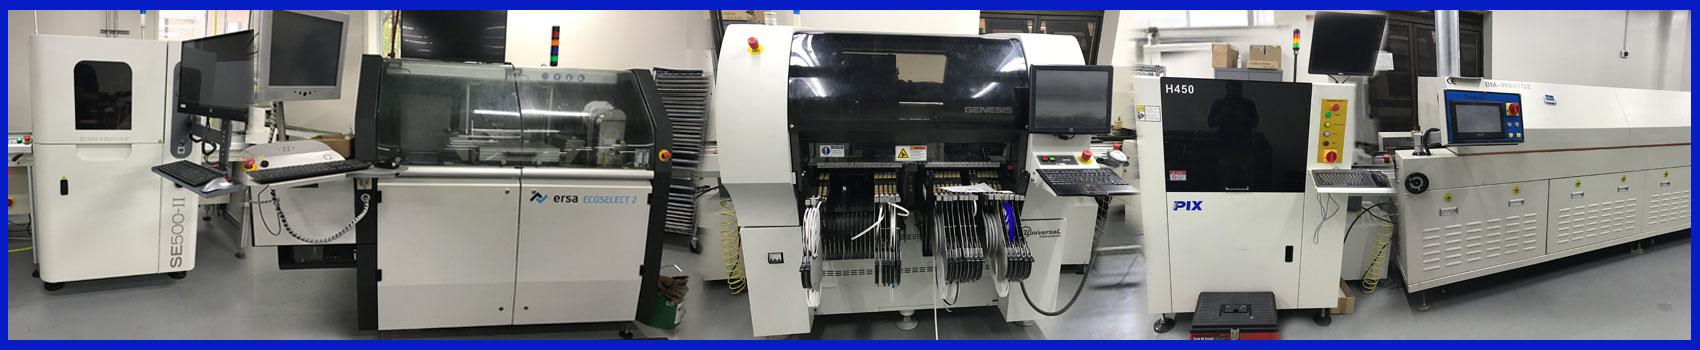 Printed Circuit Board Manufacturing Tolerances | PNC Inc